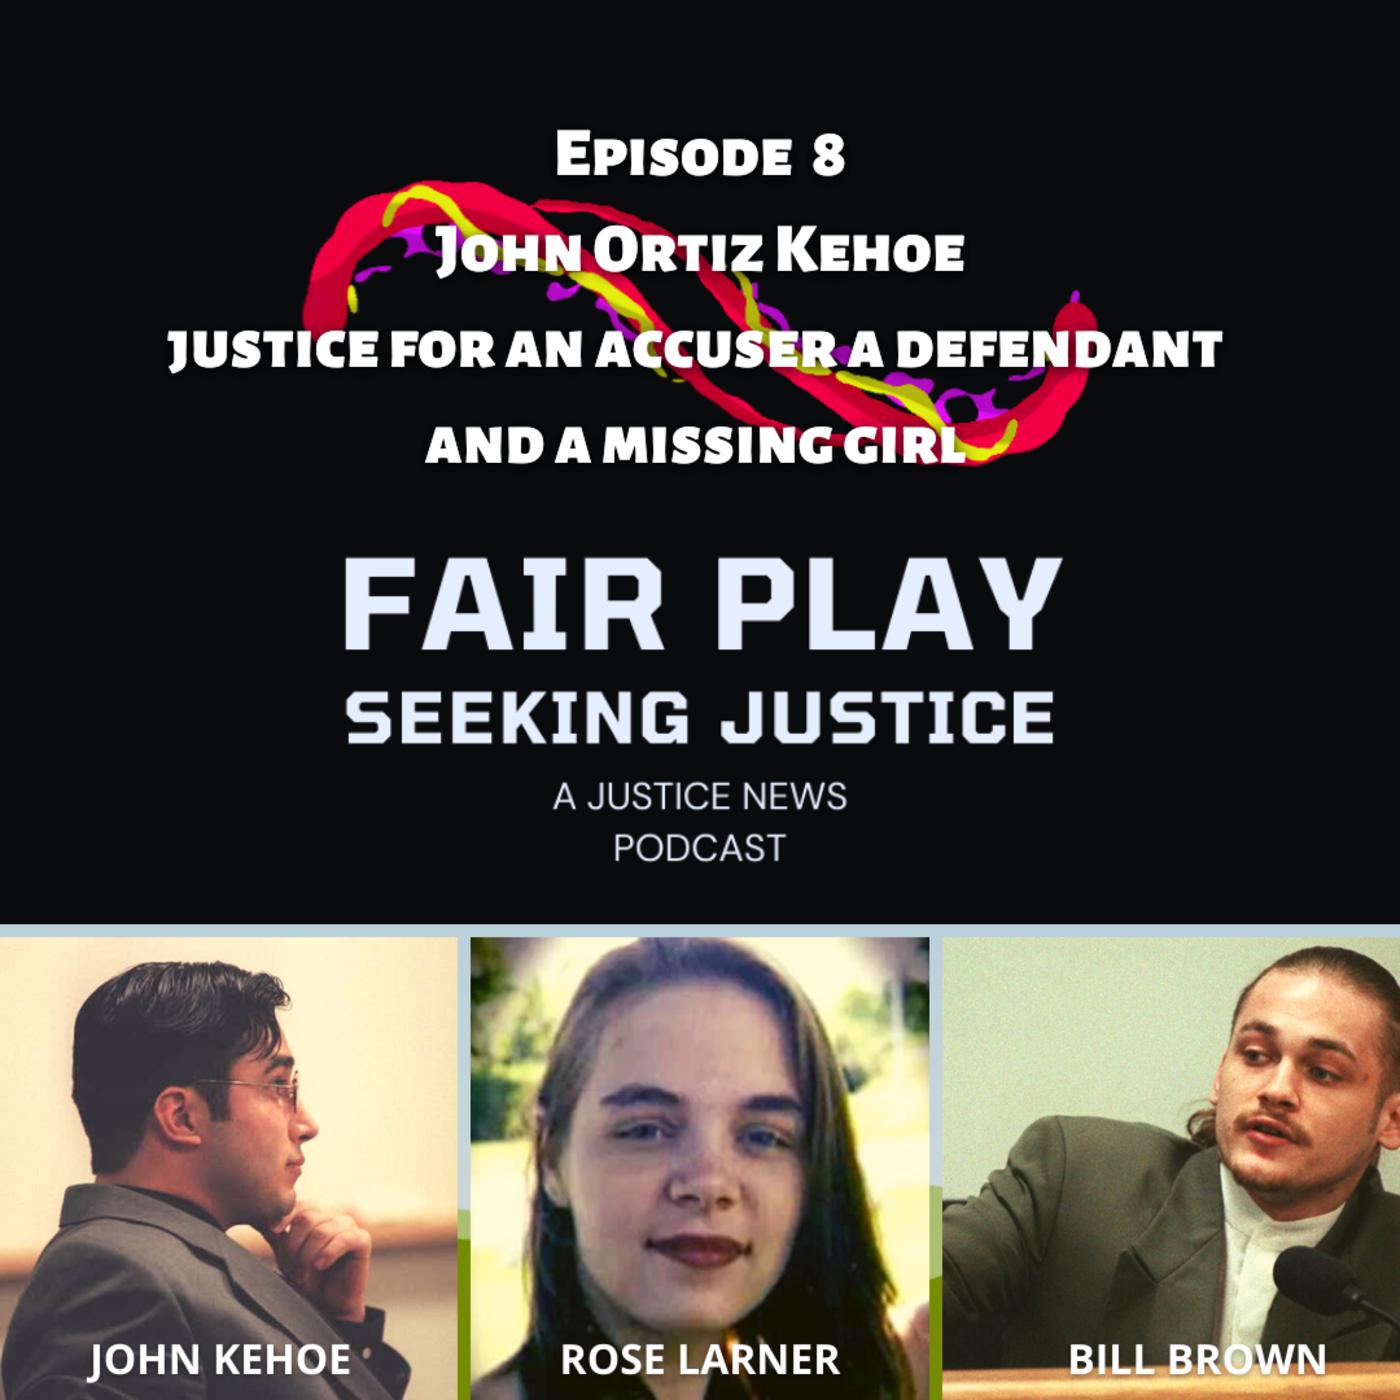 FairPlay EP8 | John Ortiz Kehoe. 25 Years and Counting